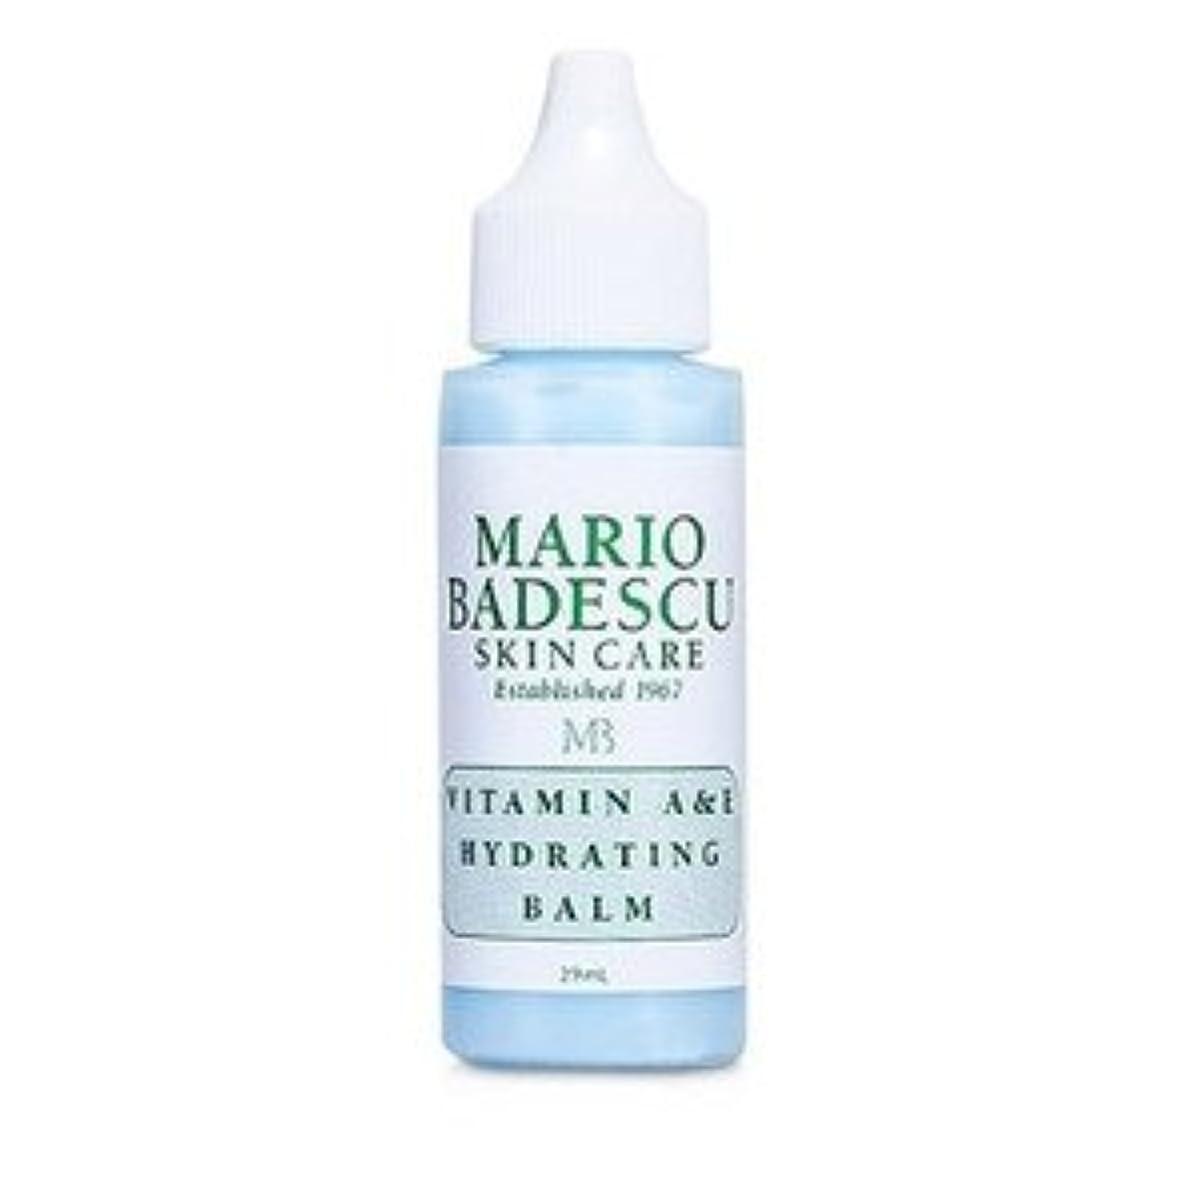 MARIO BADESCU(マリオ バデスク) ビタミン A&E ハイドレイティング バーム 29ml/1oz [並行輸入品]